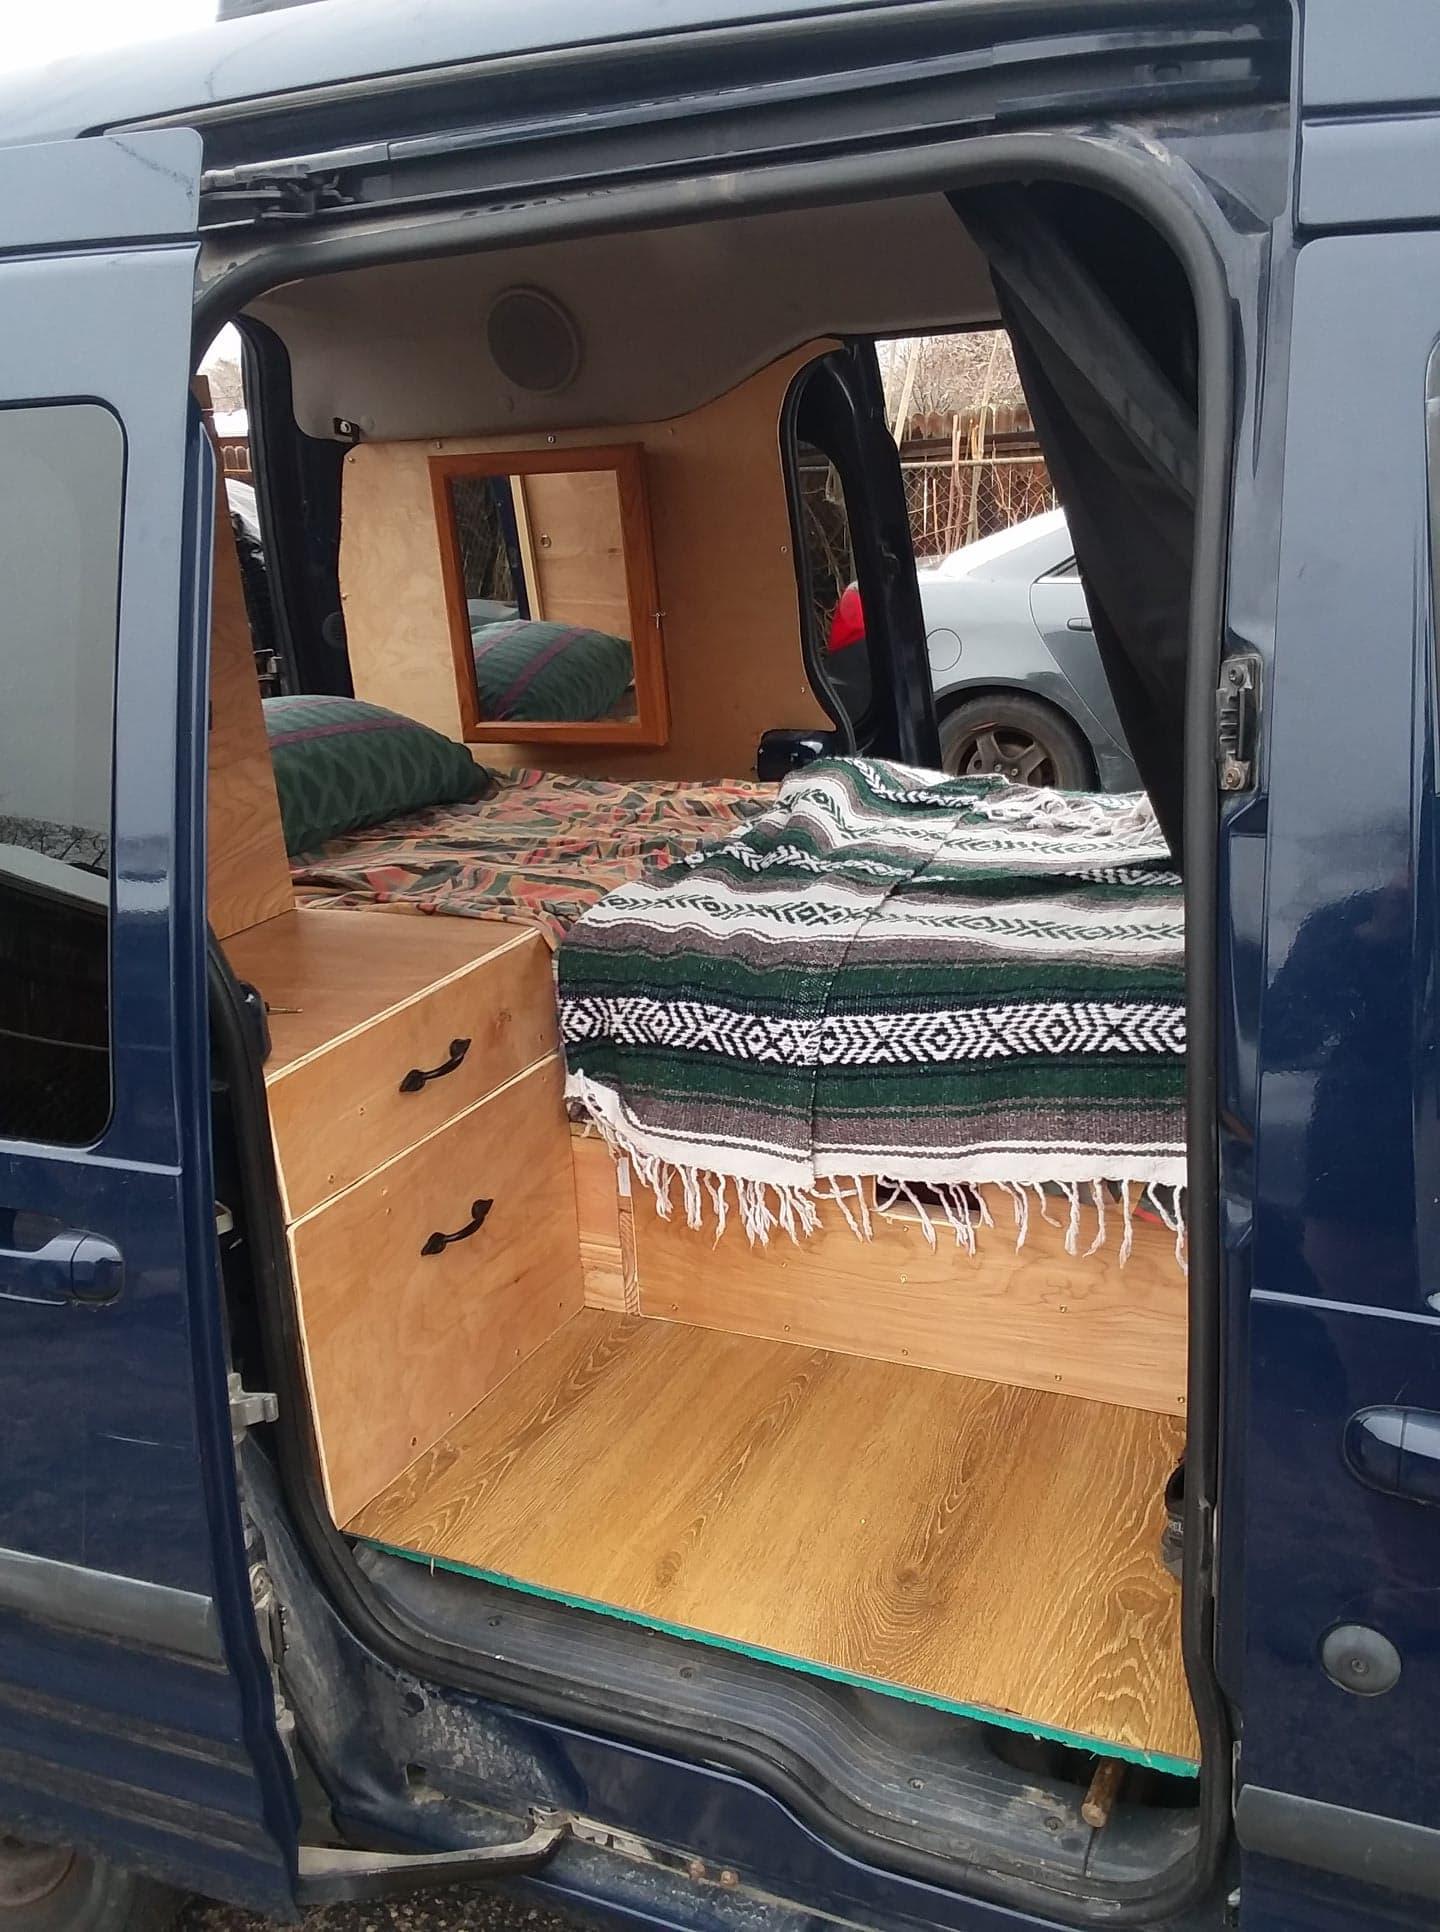 2015 Ford Transit Connect Affordable Camper Van Conversion